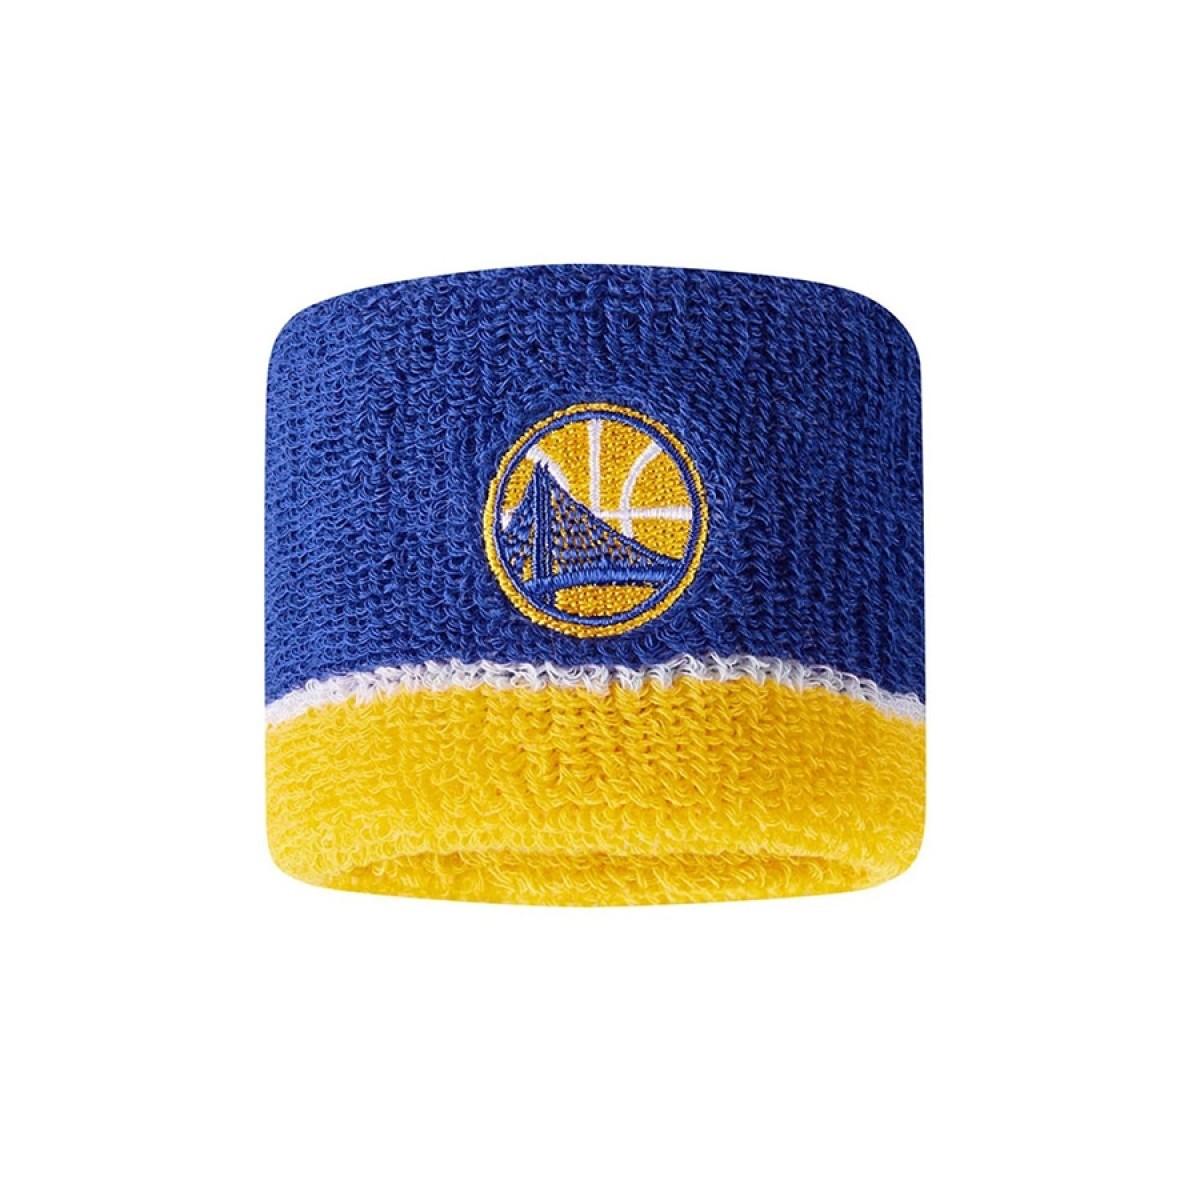 Nike NBA Wristband GS Warriors 'Blue'